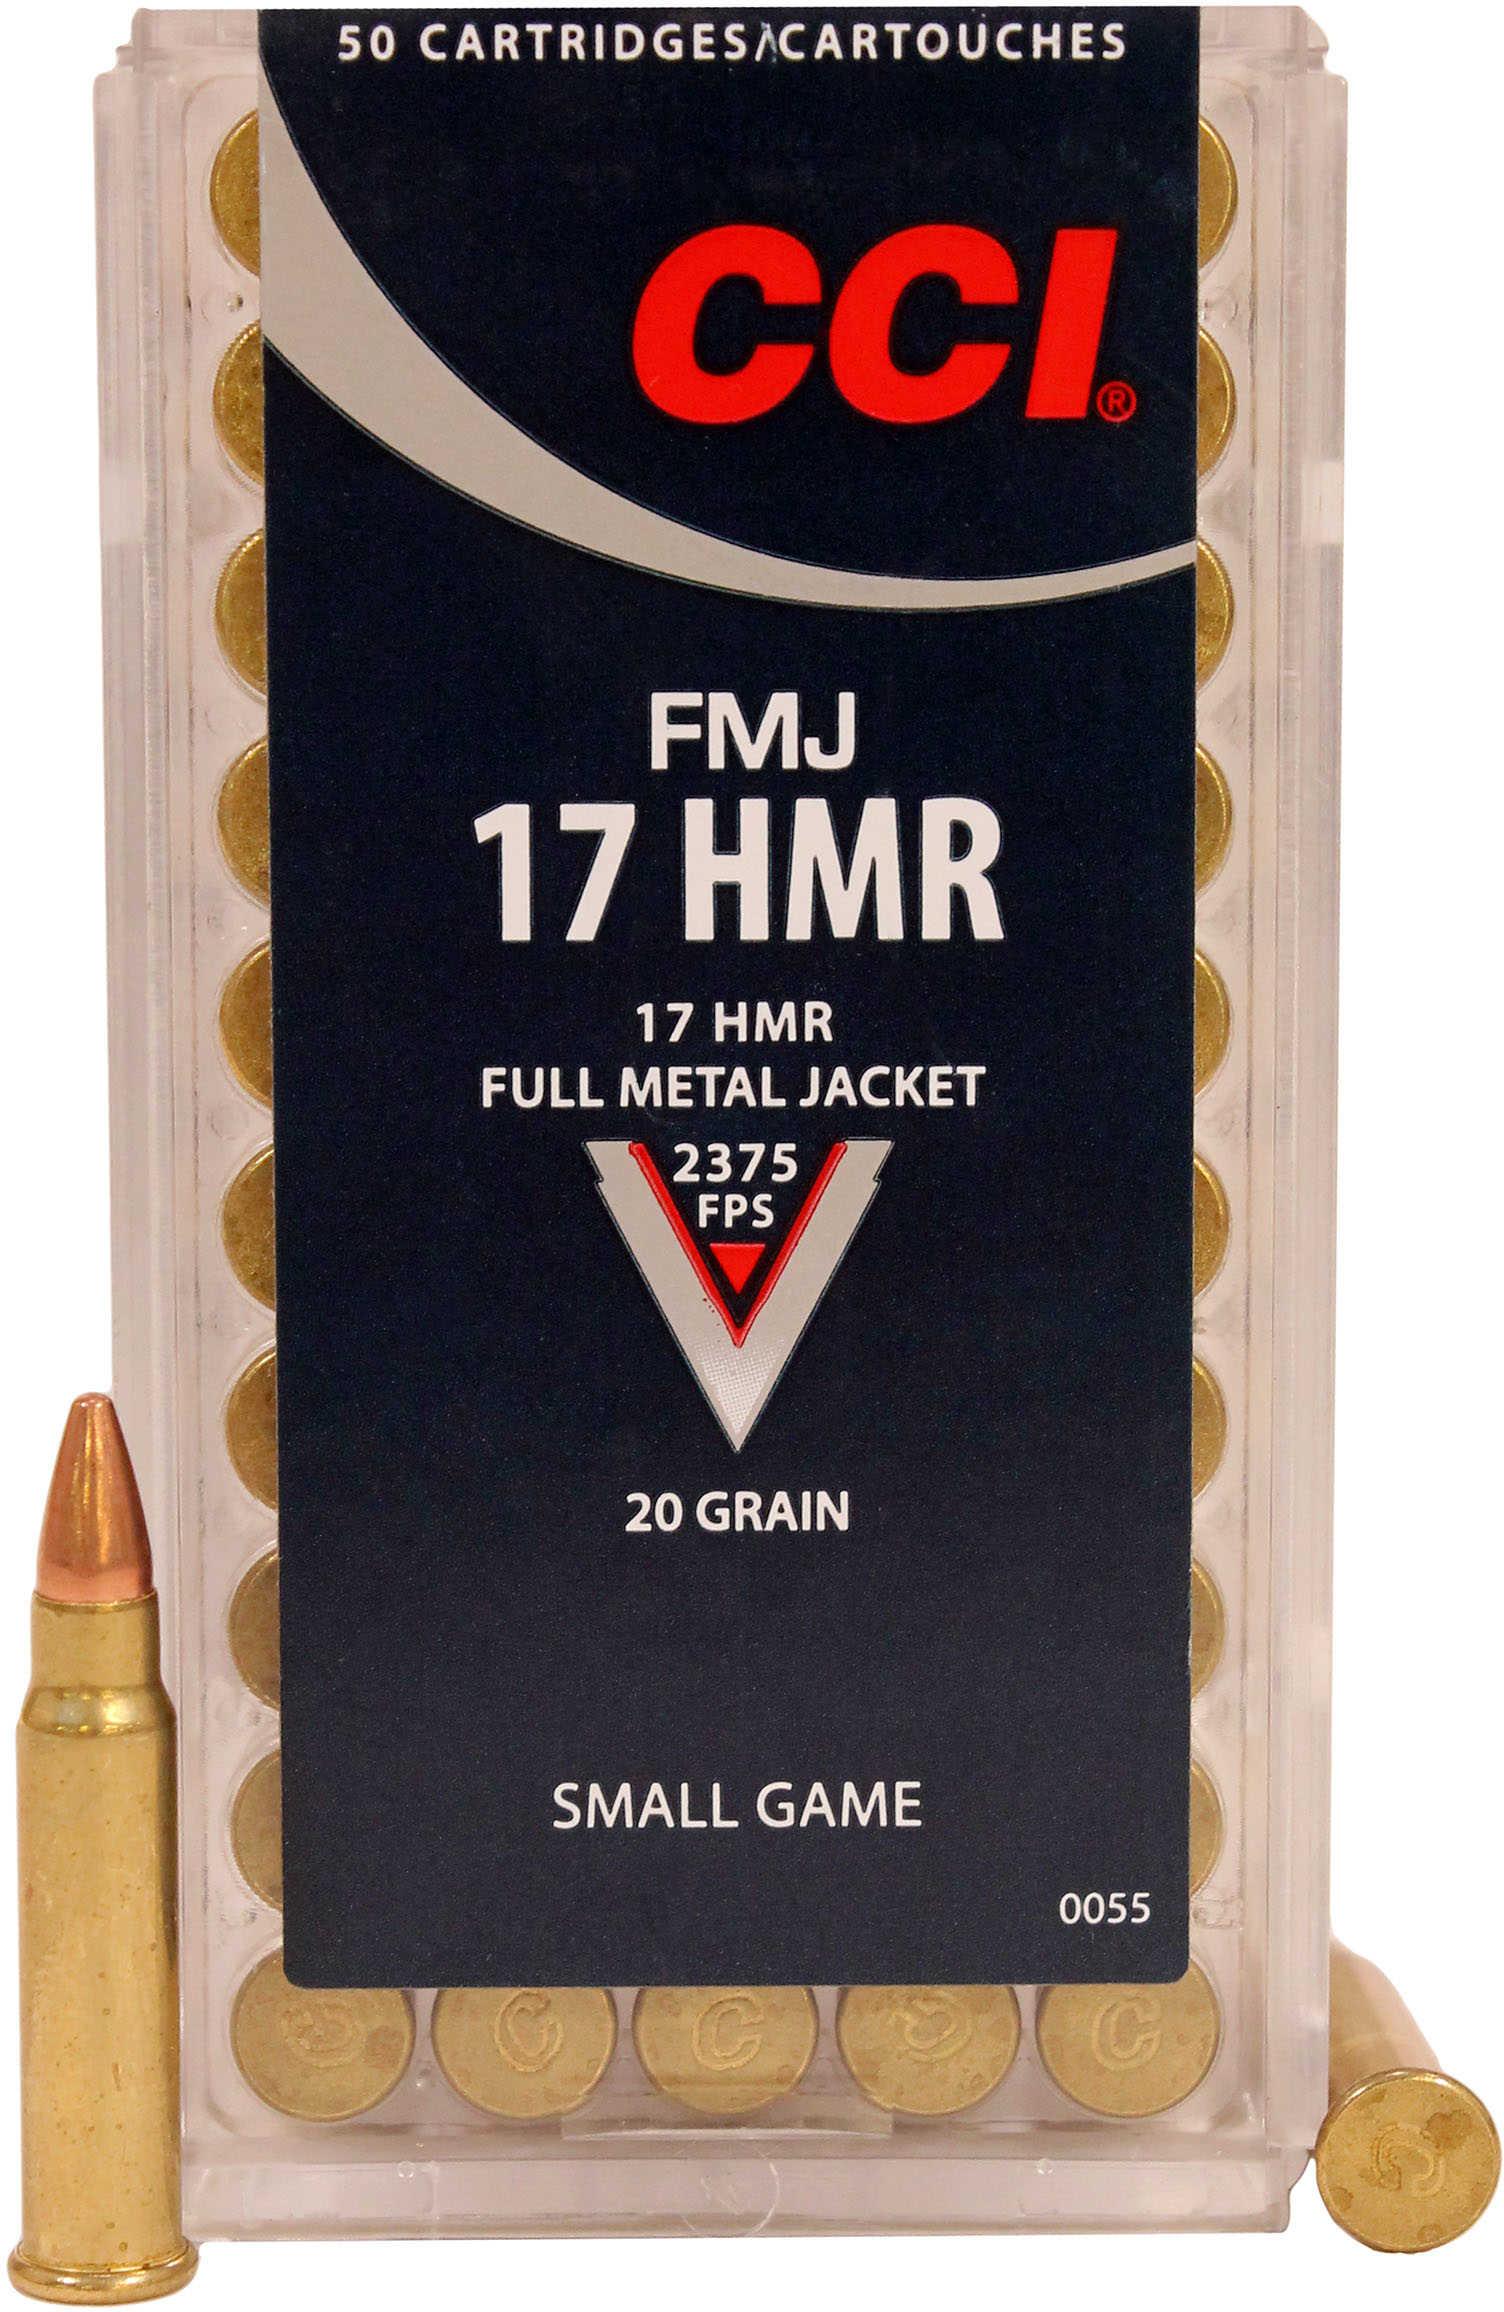 CCI/Speer Hunting 17HMR 20 Grain Full Metal Jacket 50 Round Box 55